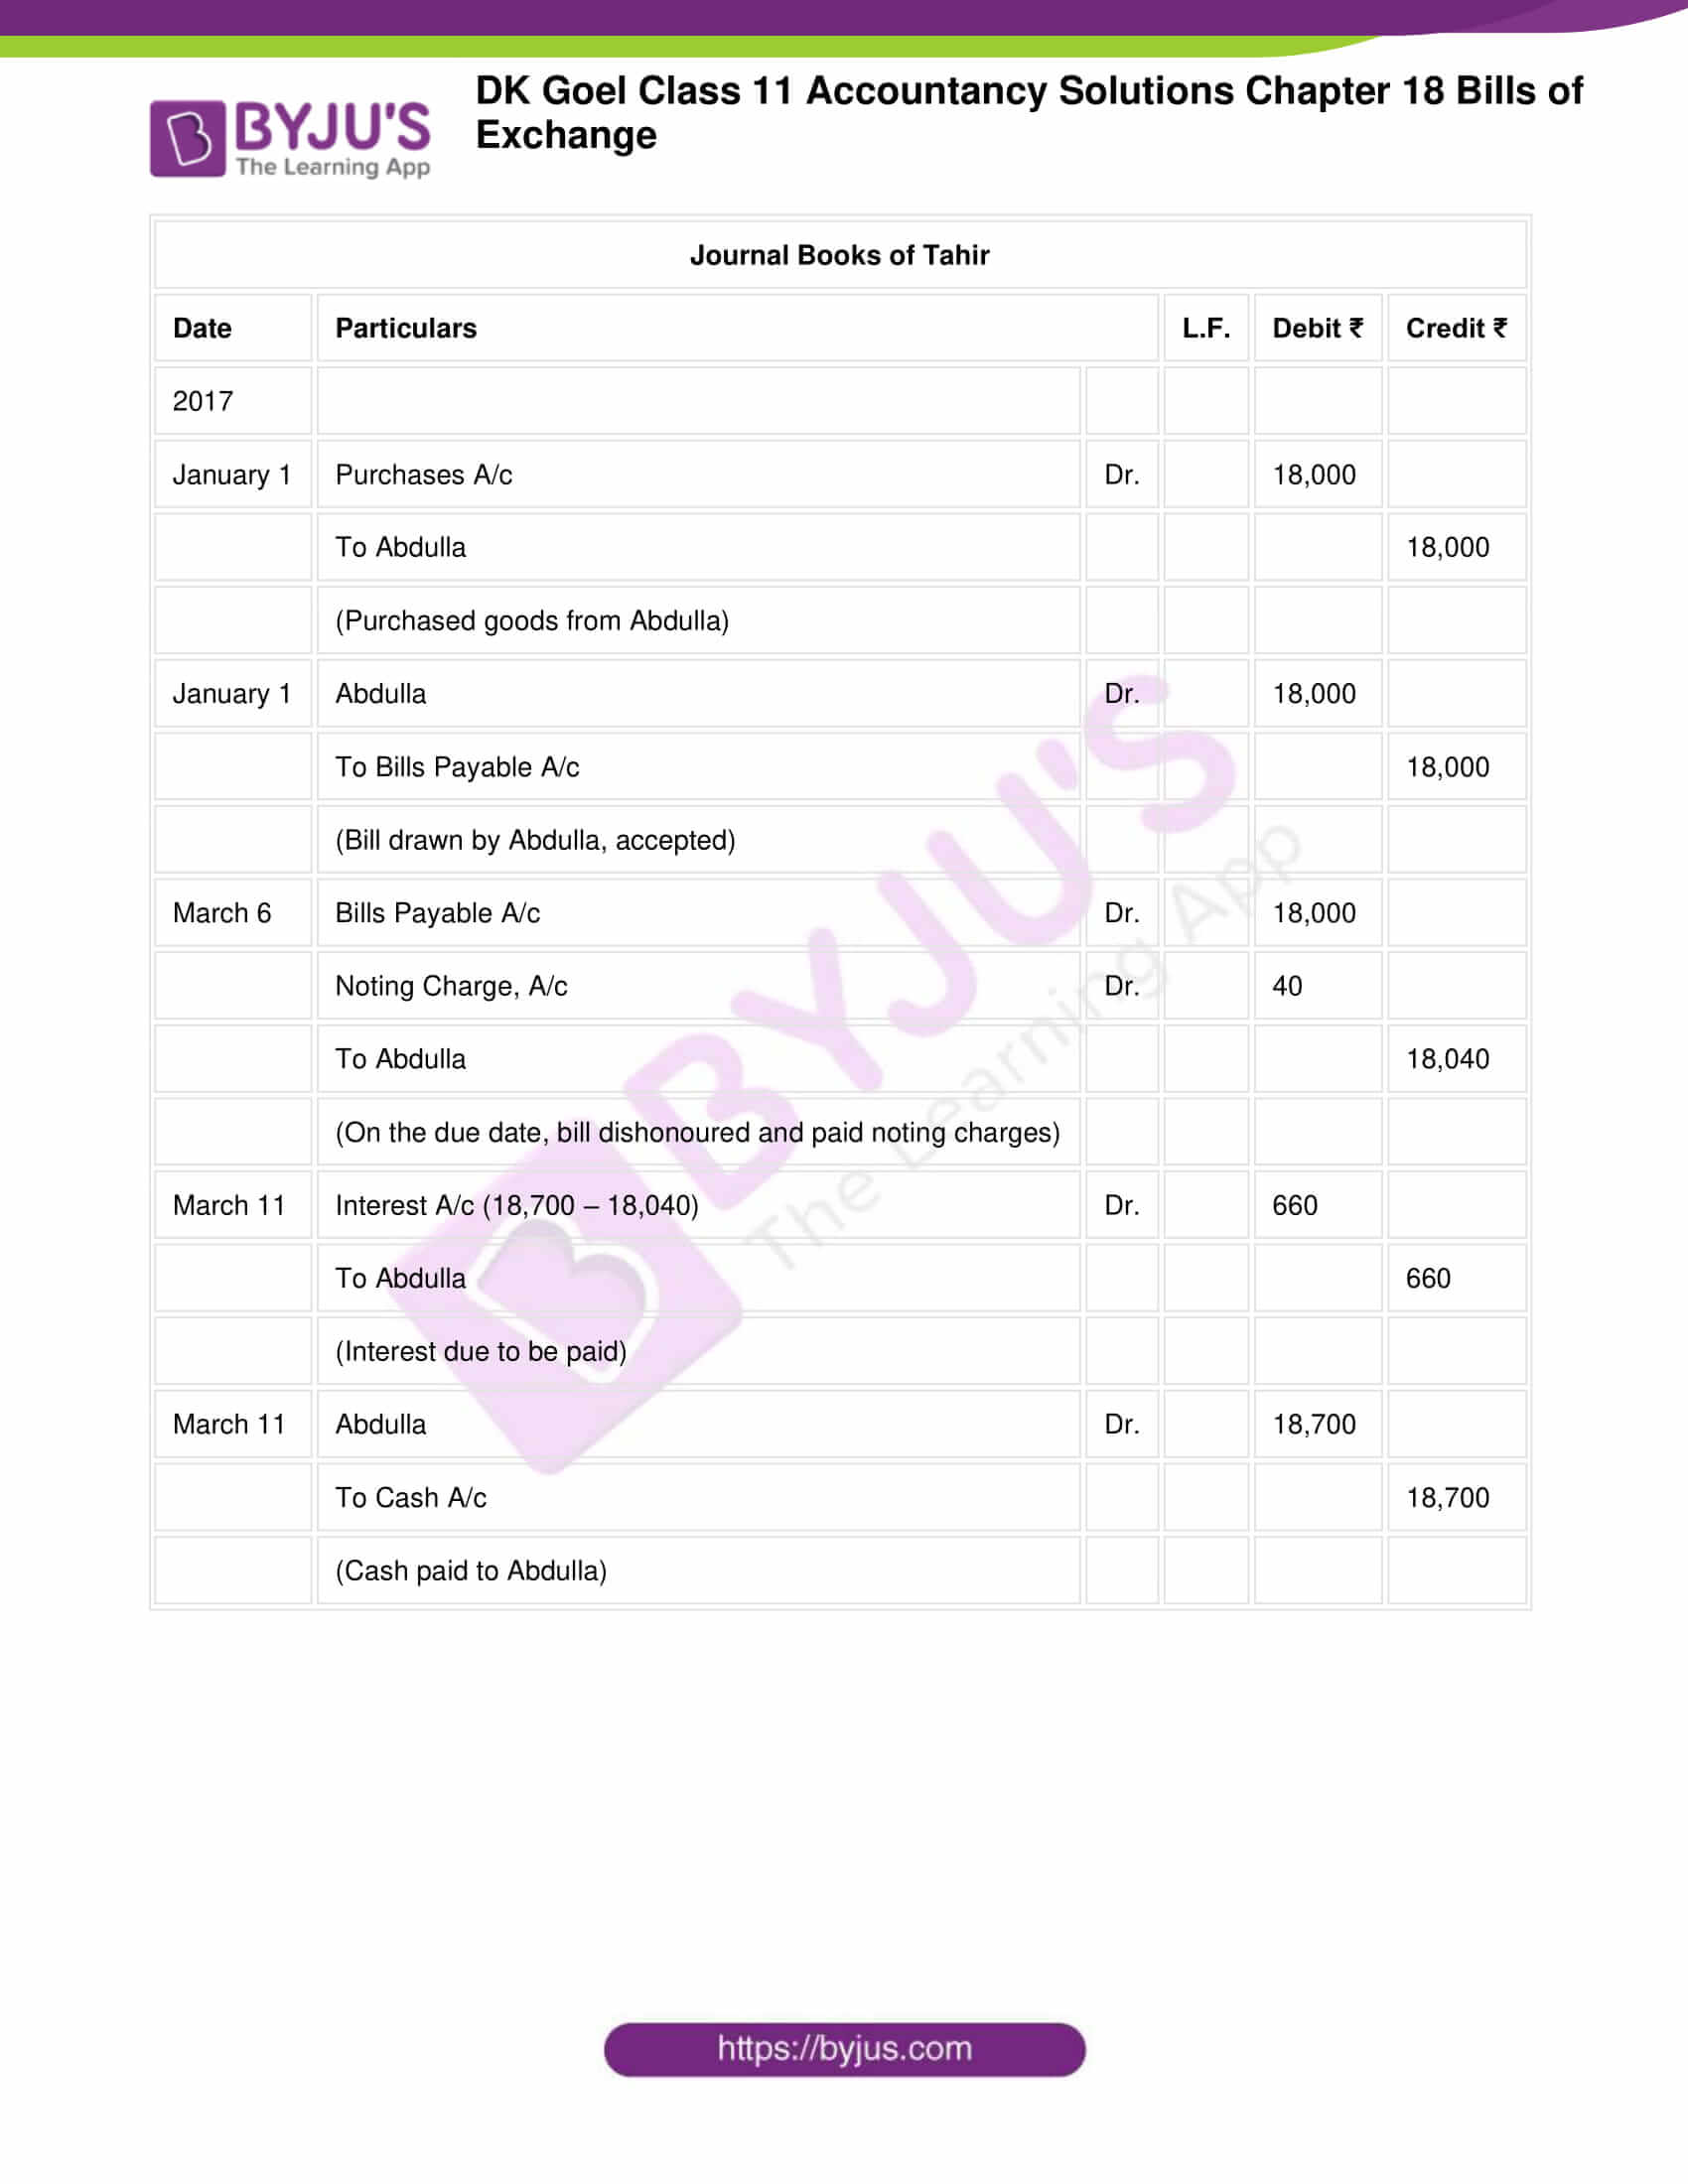 dk goel class 11 accountancy solutions chapter 18 092